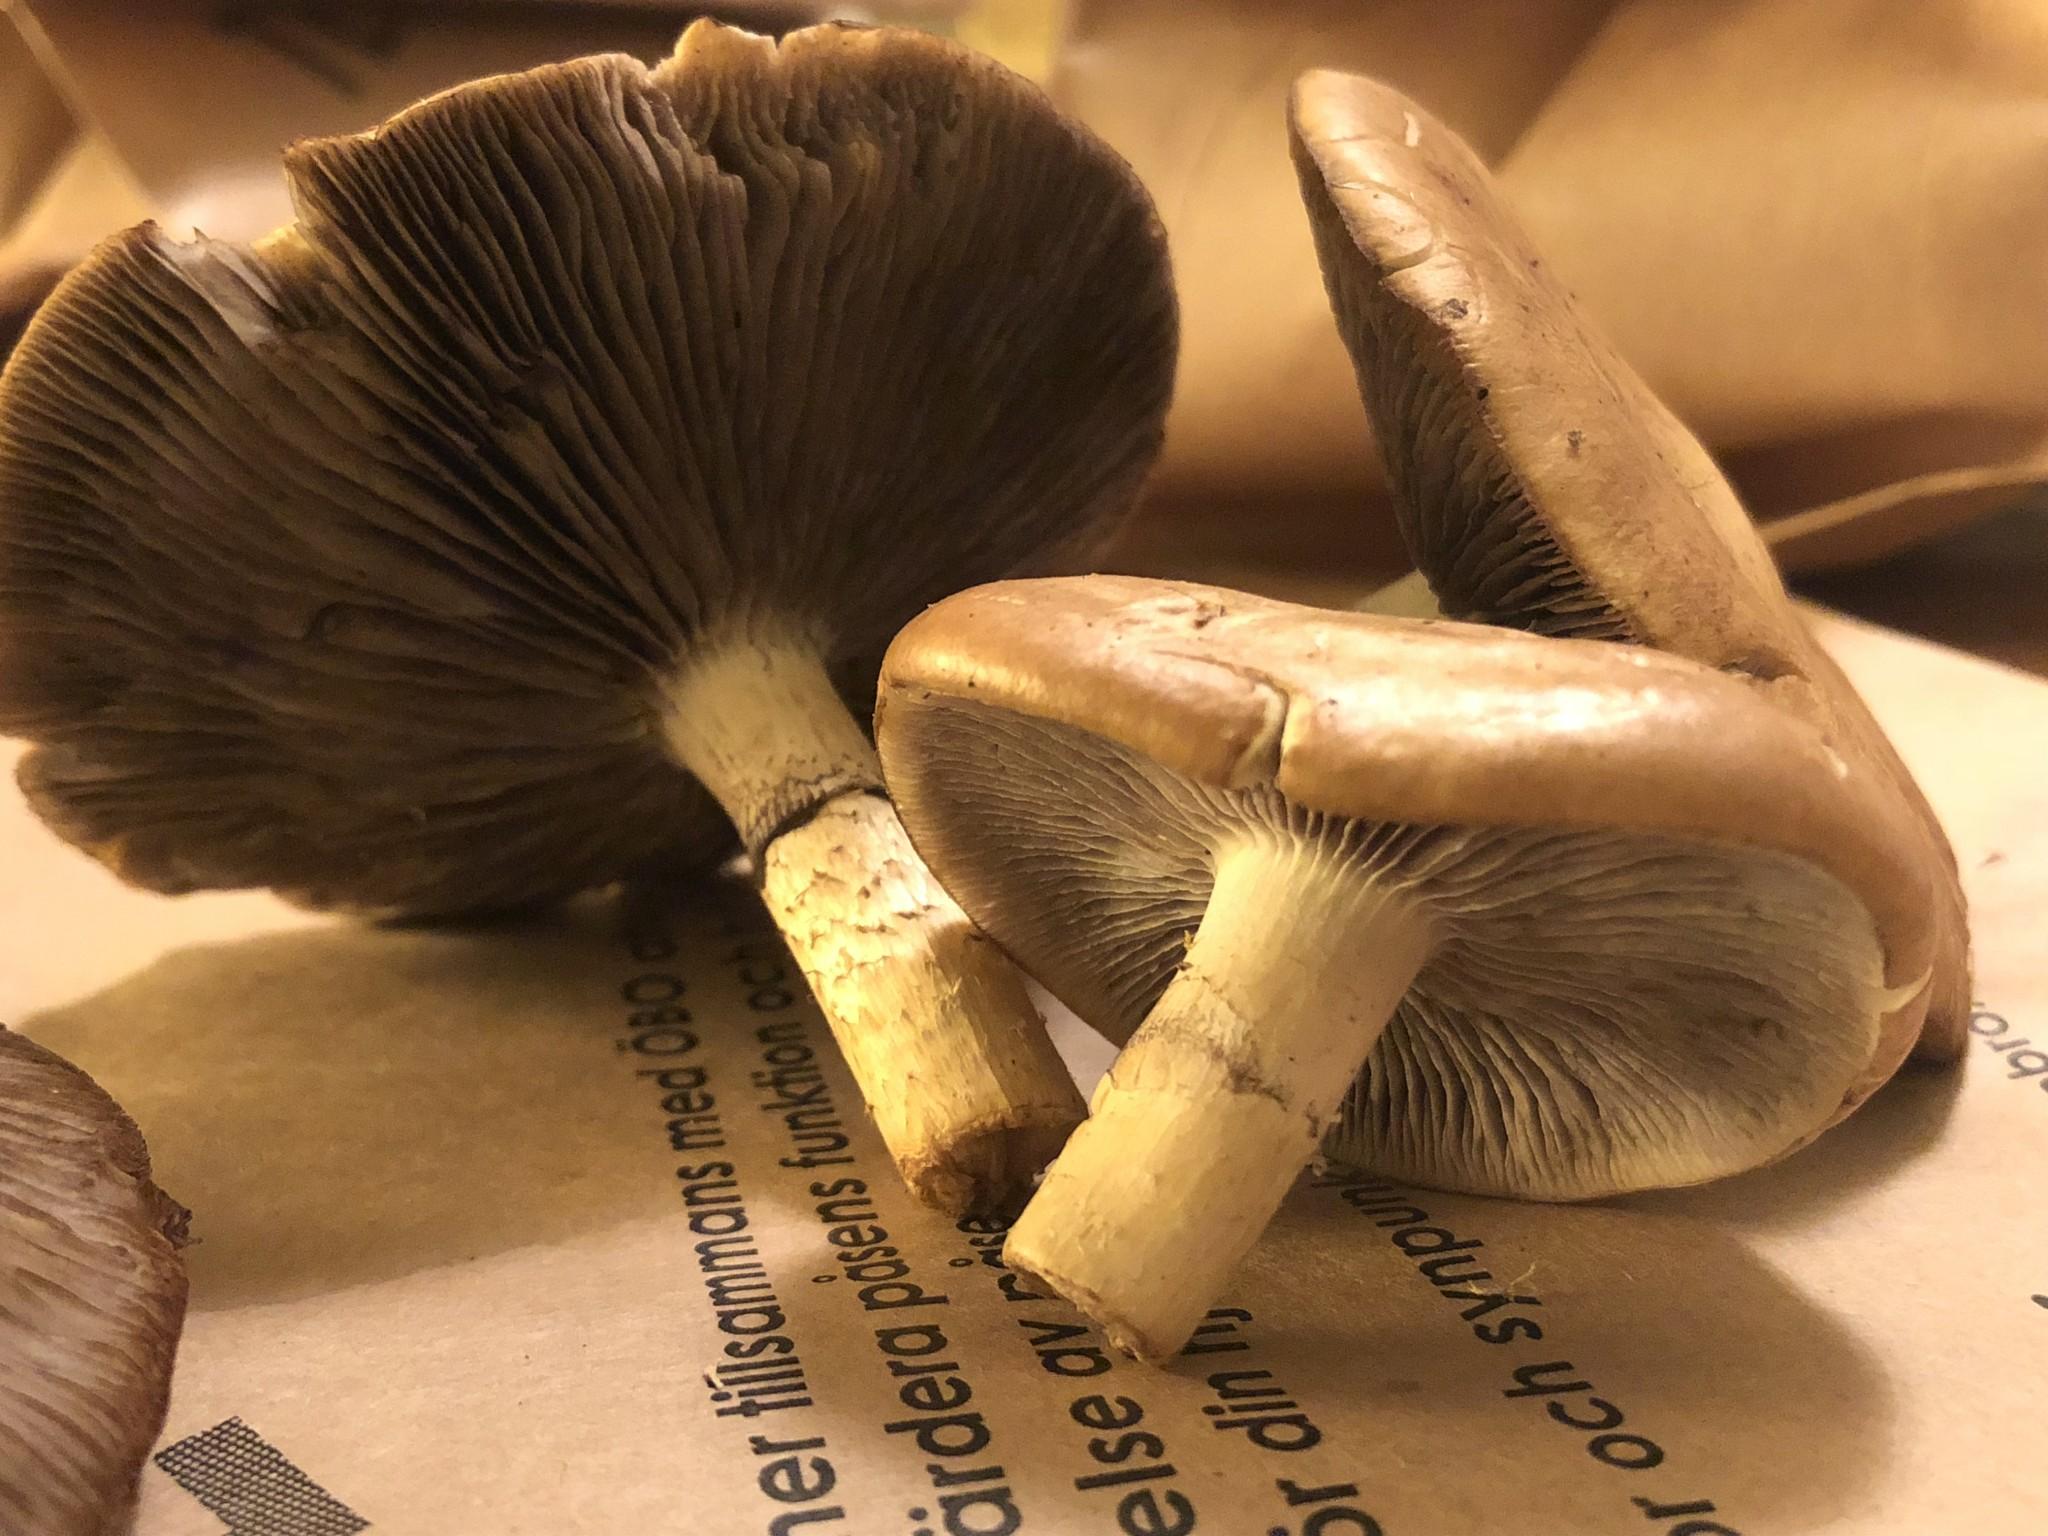 svamp under ring